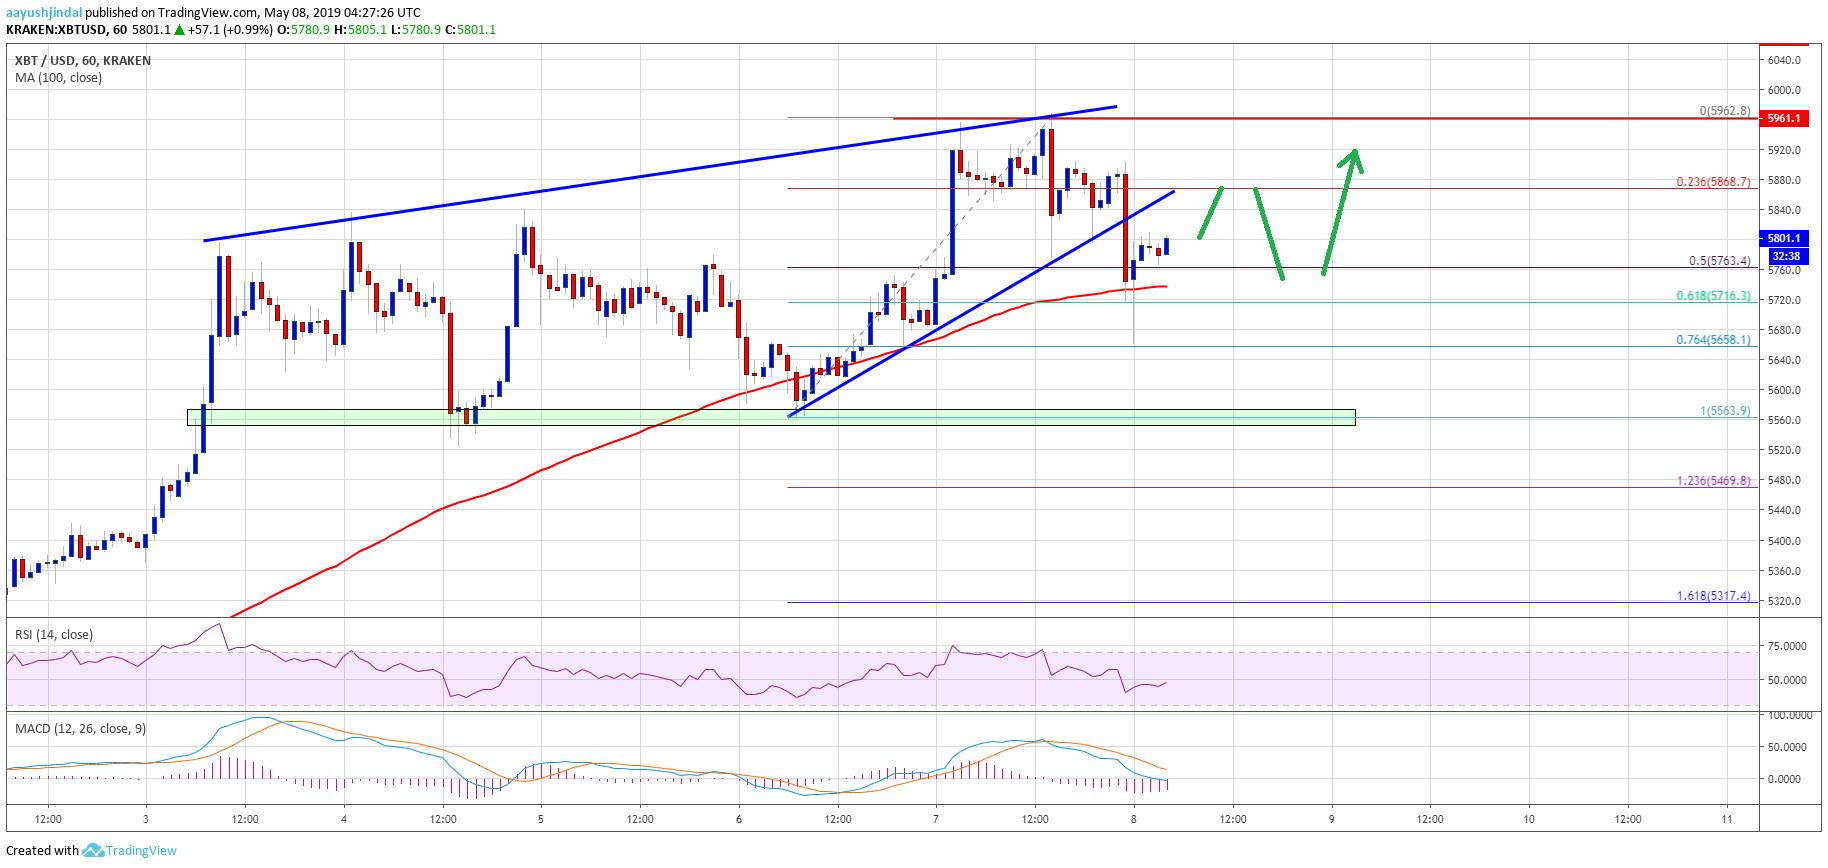 Bitcoin (BTC) Price Remains Strong Buy On Dips Despite Binance Hack